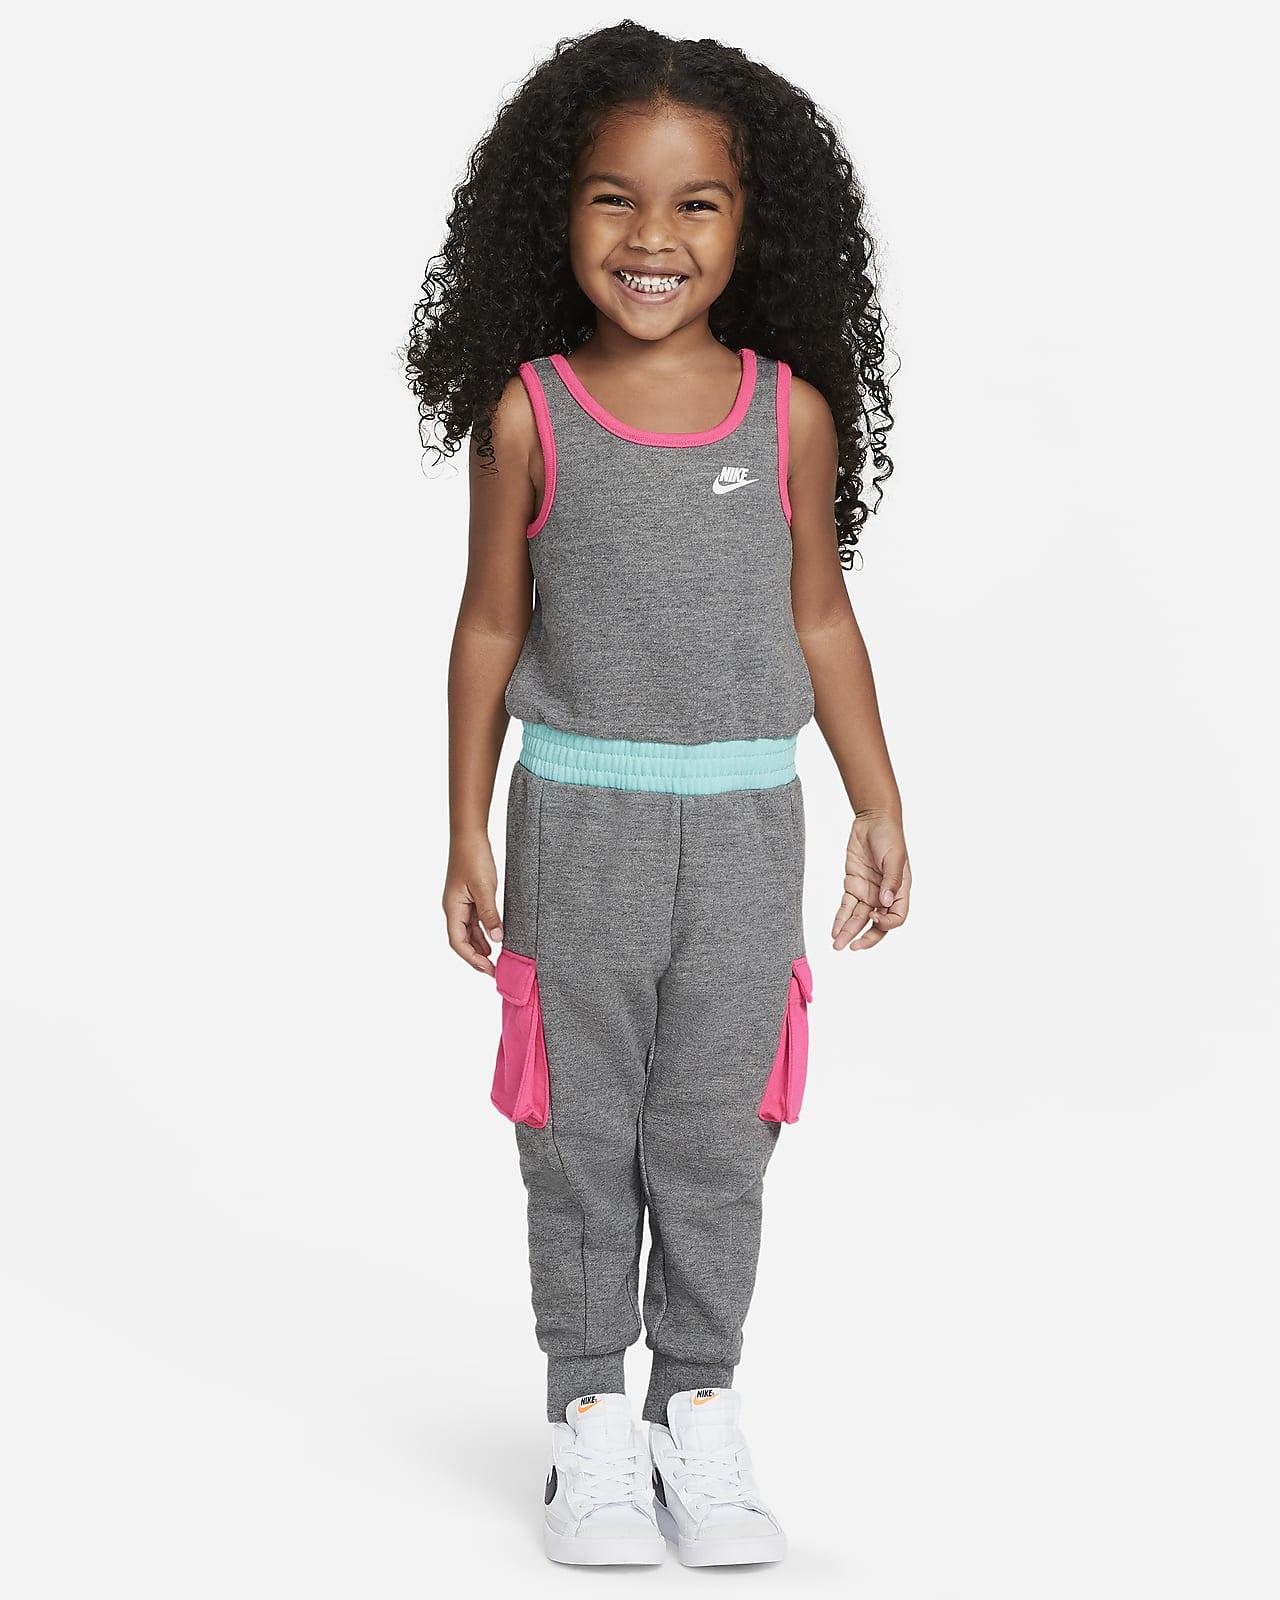 Nike Sportswear Toddler Jumpsuit